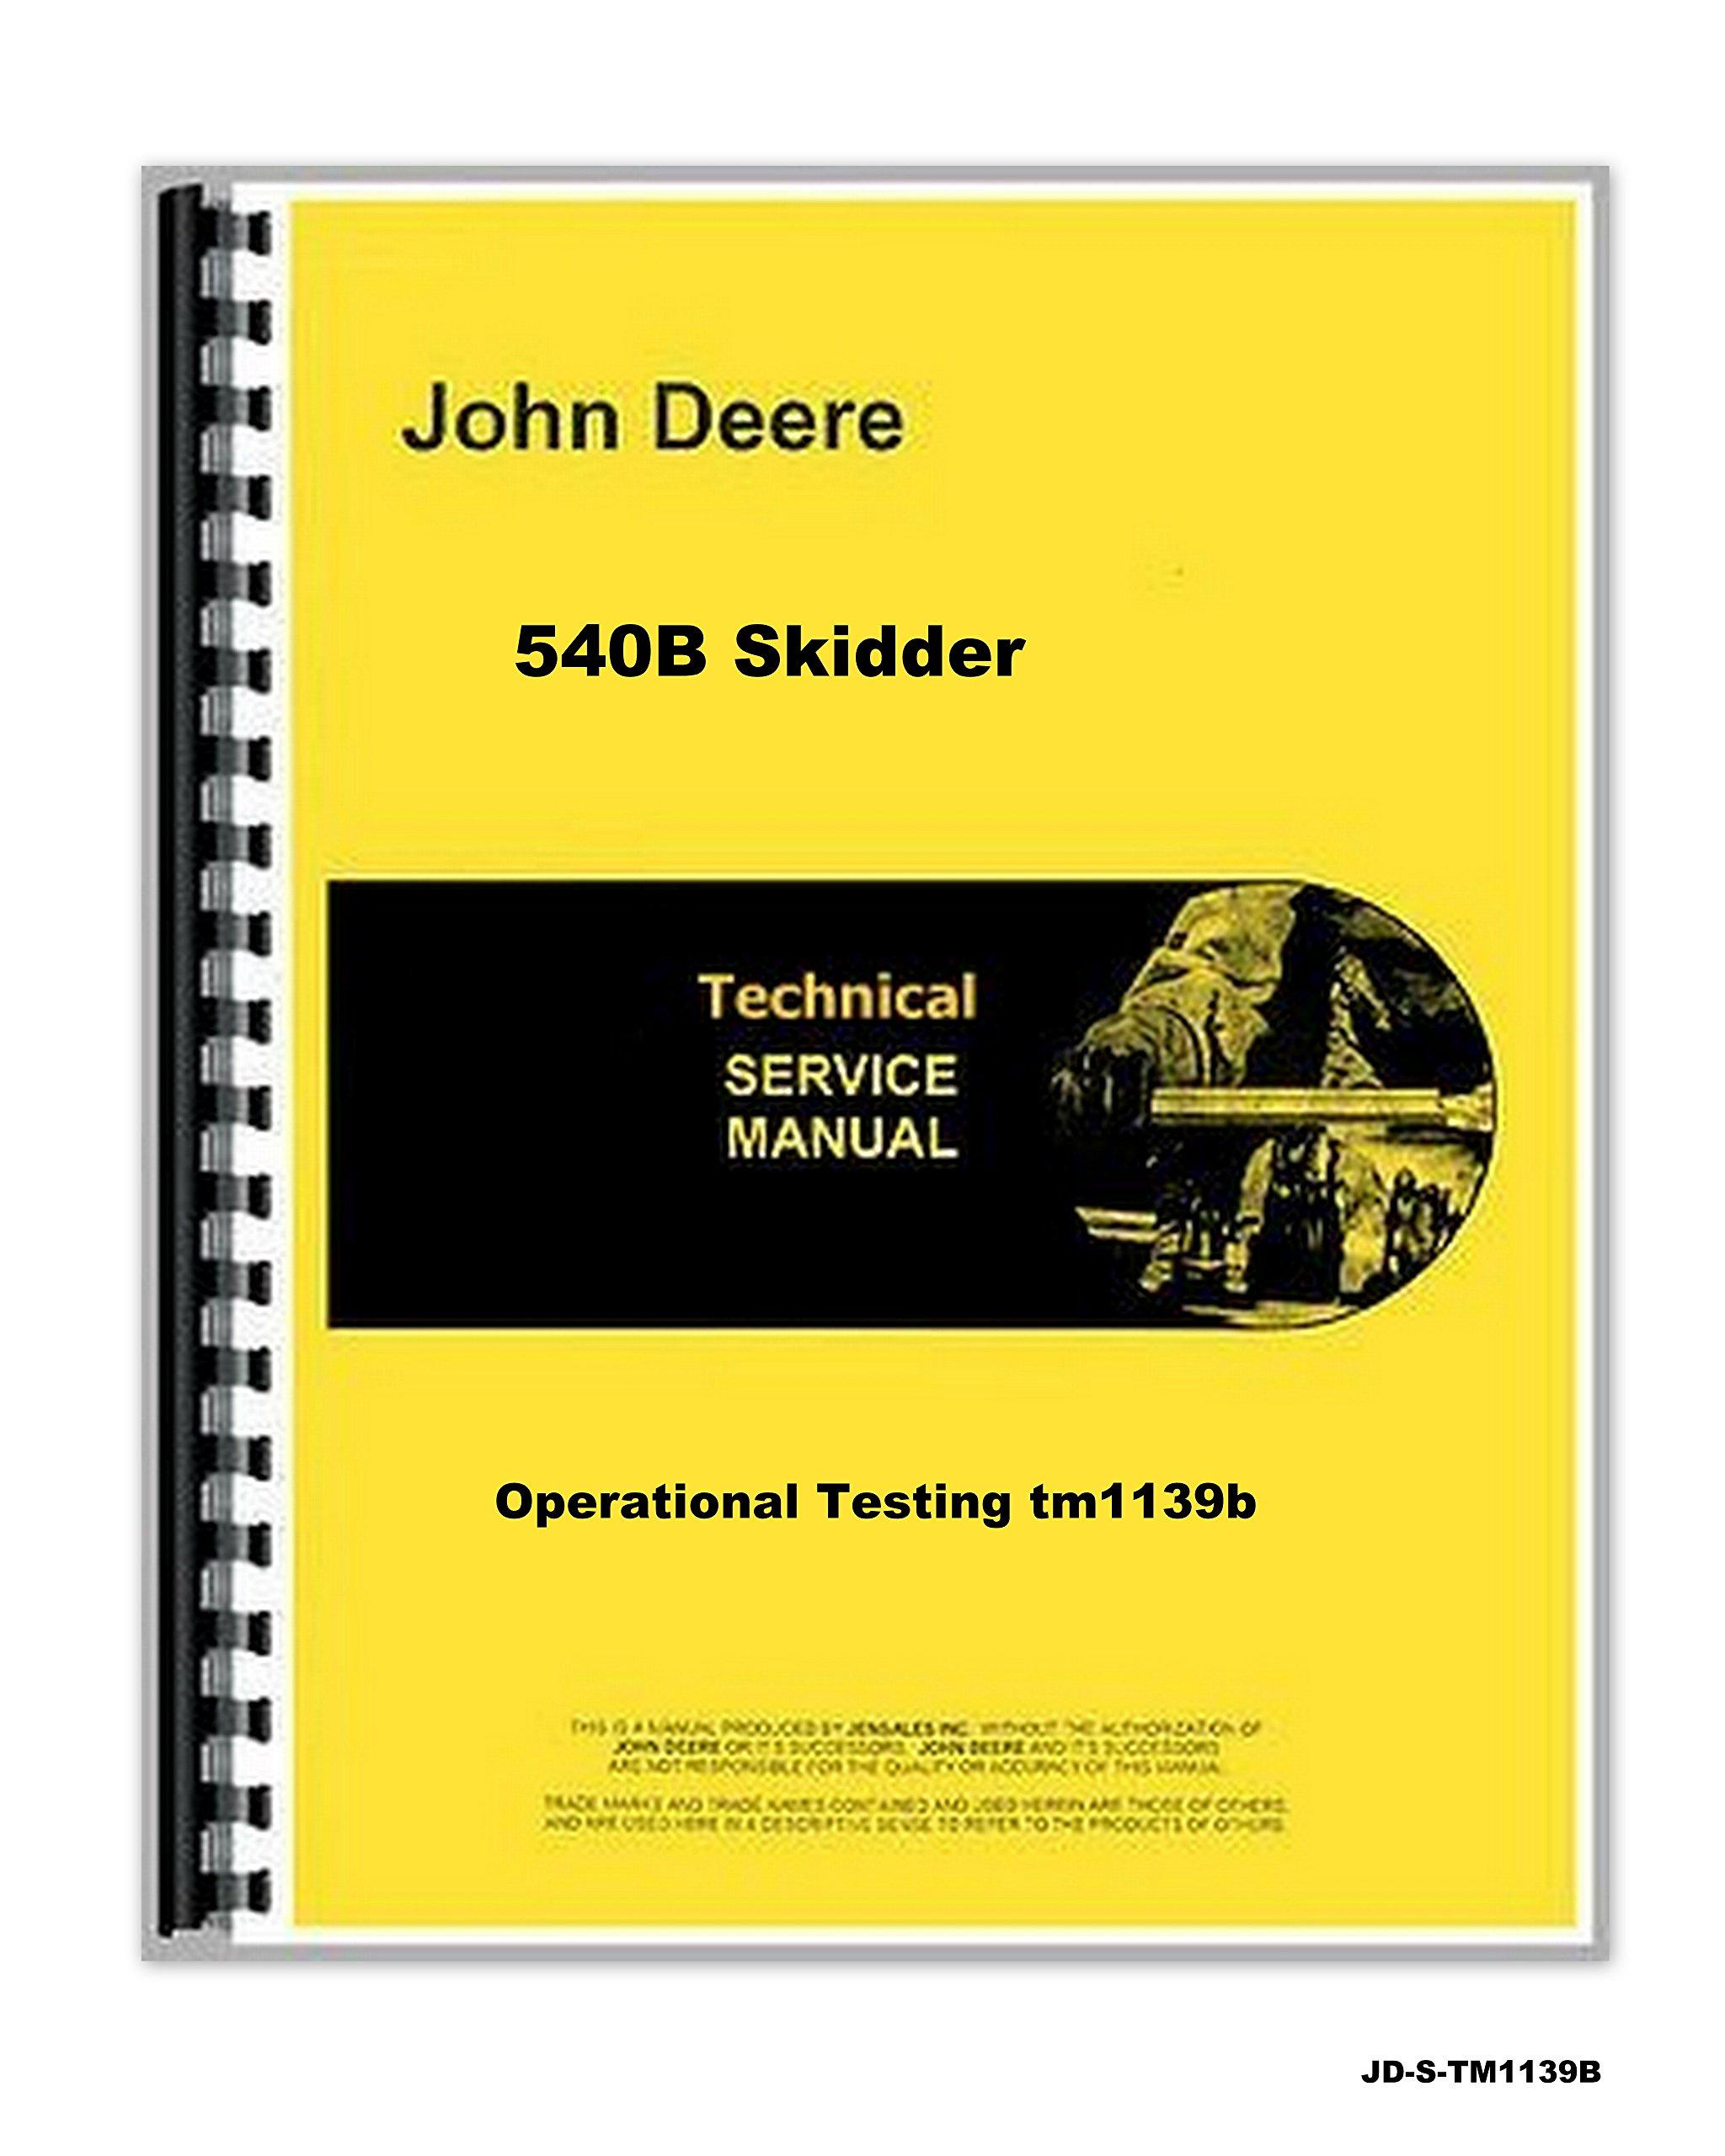 John Deere 540B Skidder Operational Testing Technical Service Manual: John  Deere: 0739718154377: Amazon.com: Books